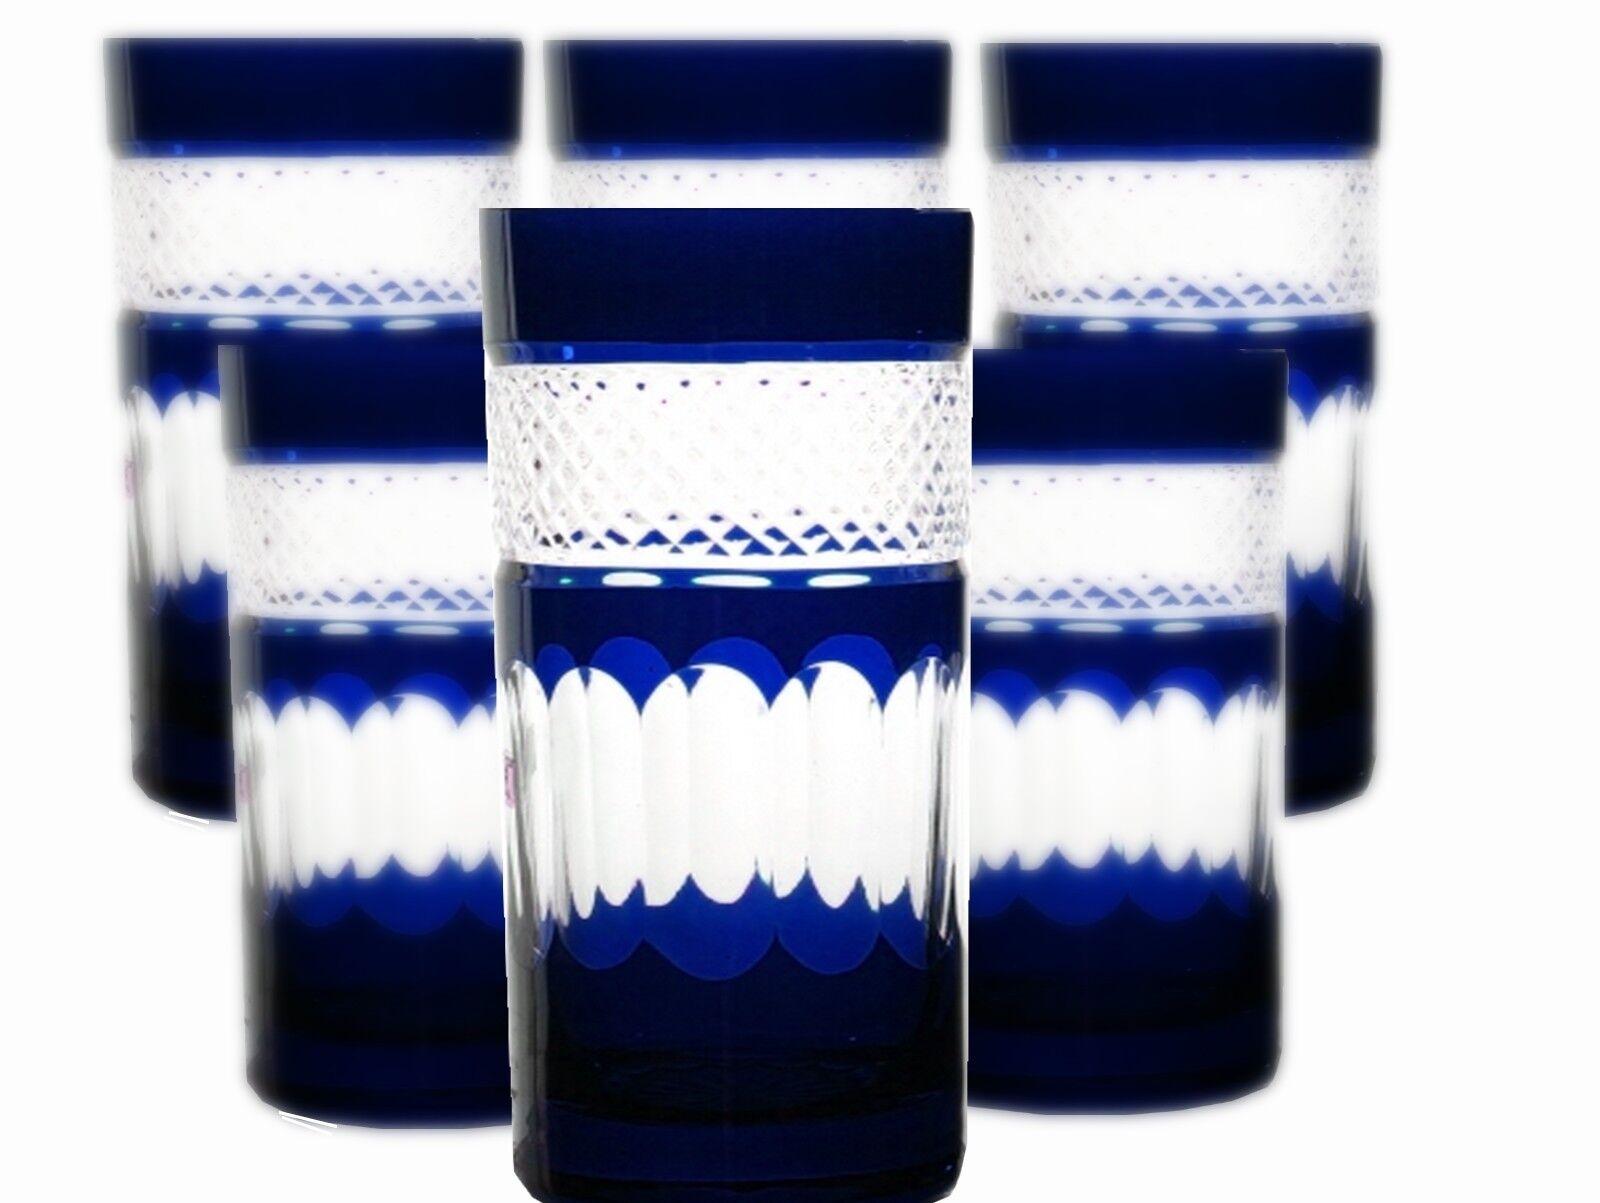 Longdrink verres bleikristall Romains 6 St. (283 obgb) Bleu bleikristall potable Verres